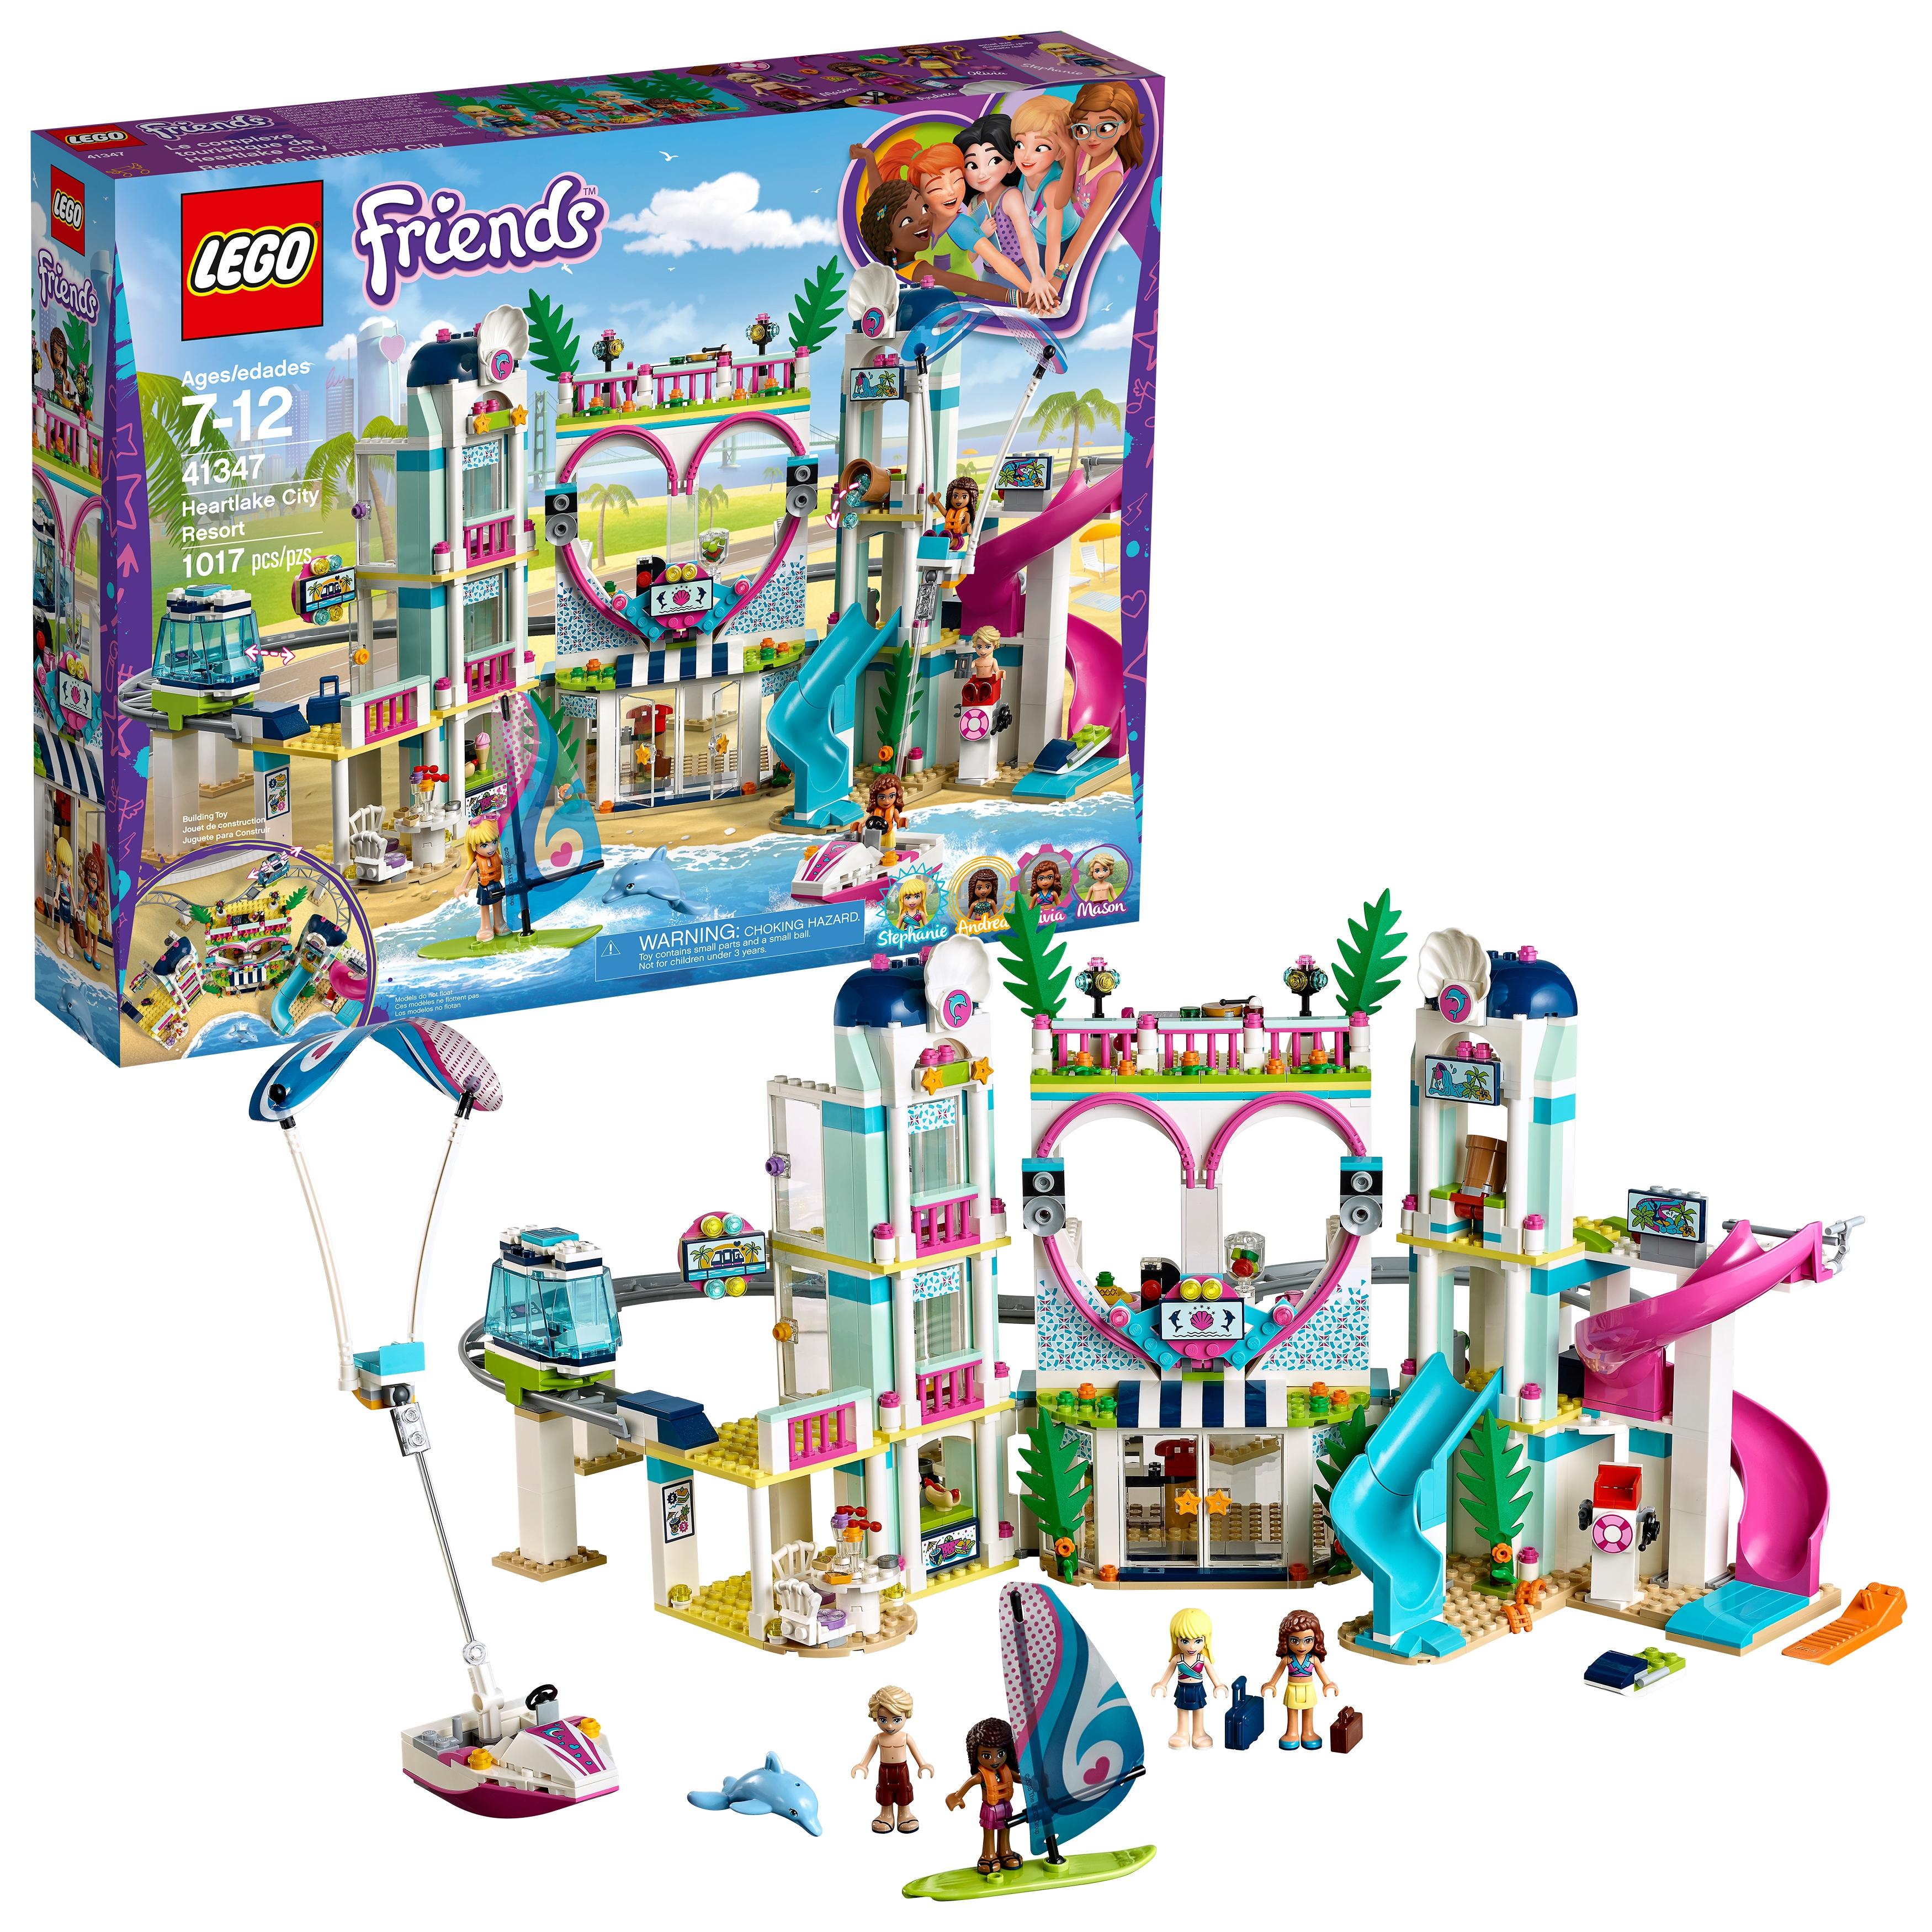 LEGO Friends Heartlake City Resort 41347 - Walmart.com